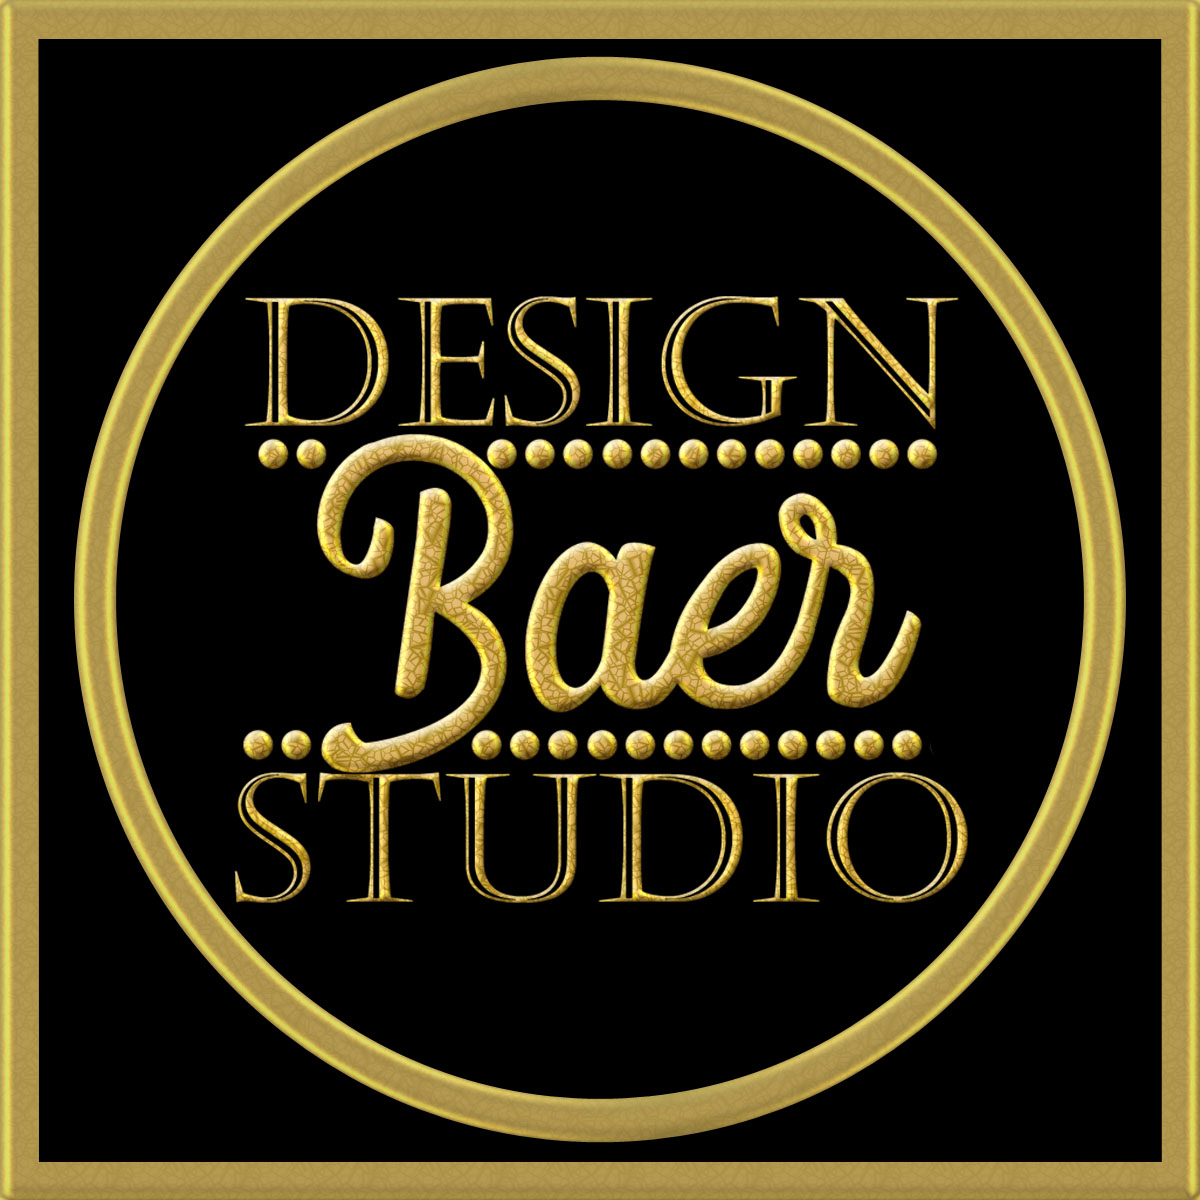 Baer Design Studio